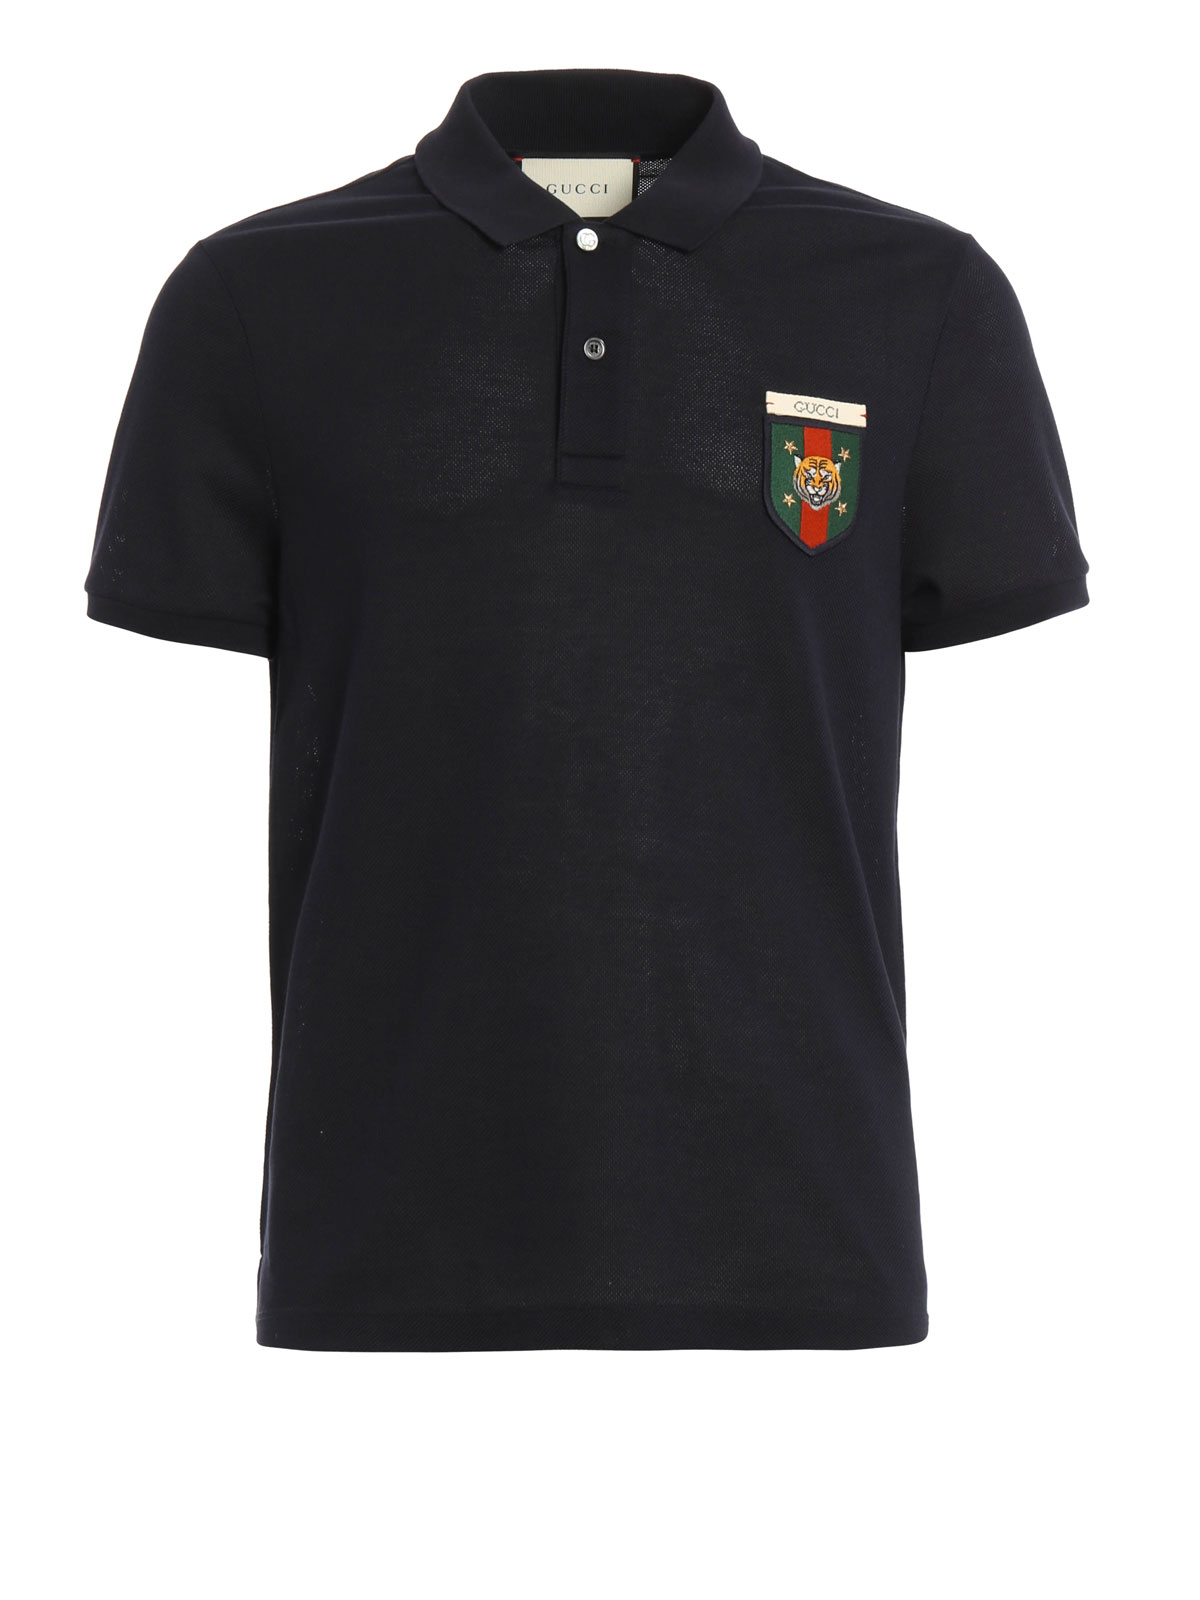 Gucci - Web crest detail polo shirt